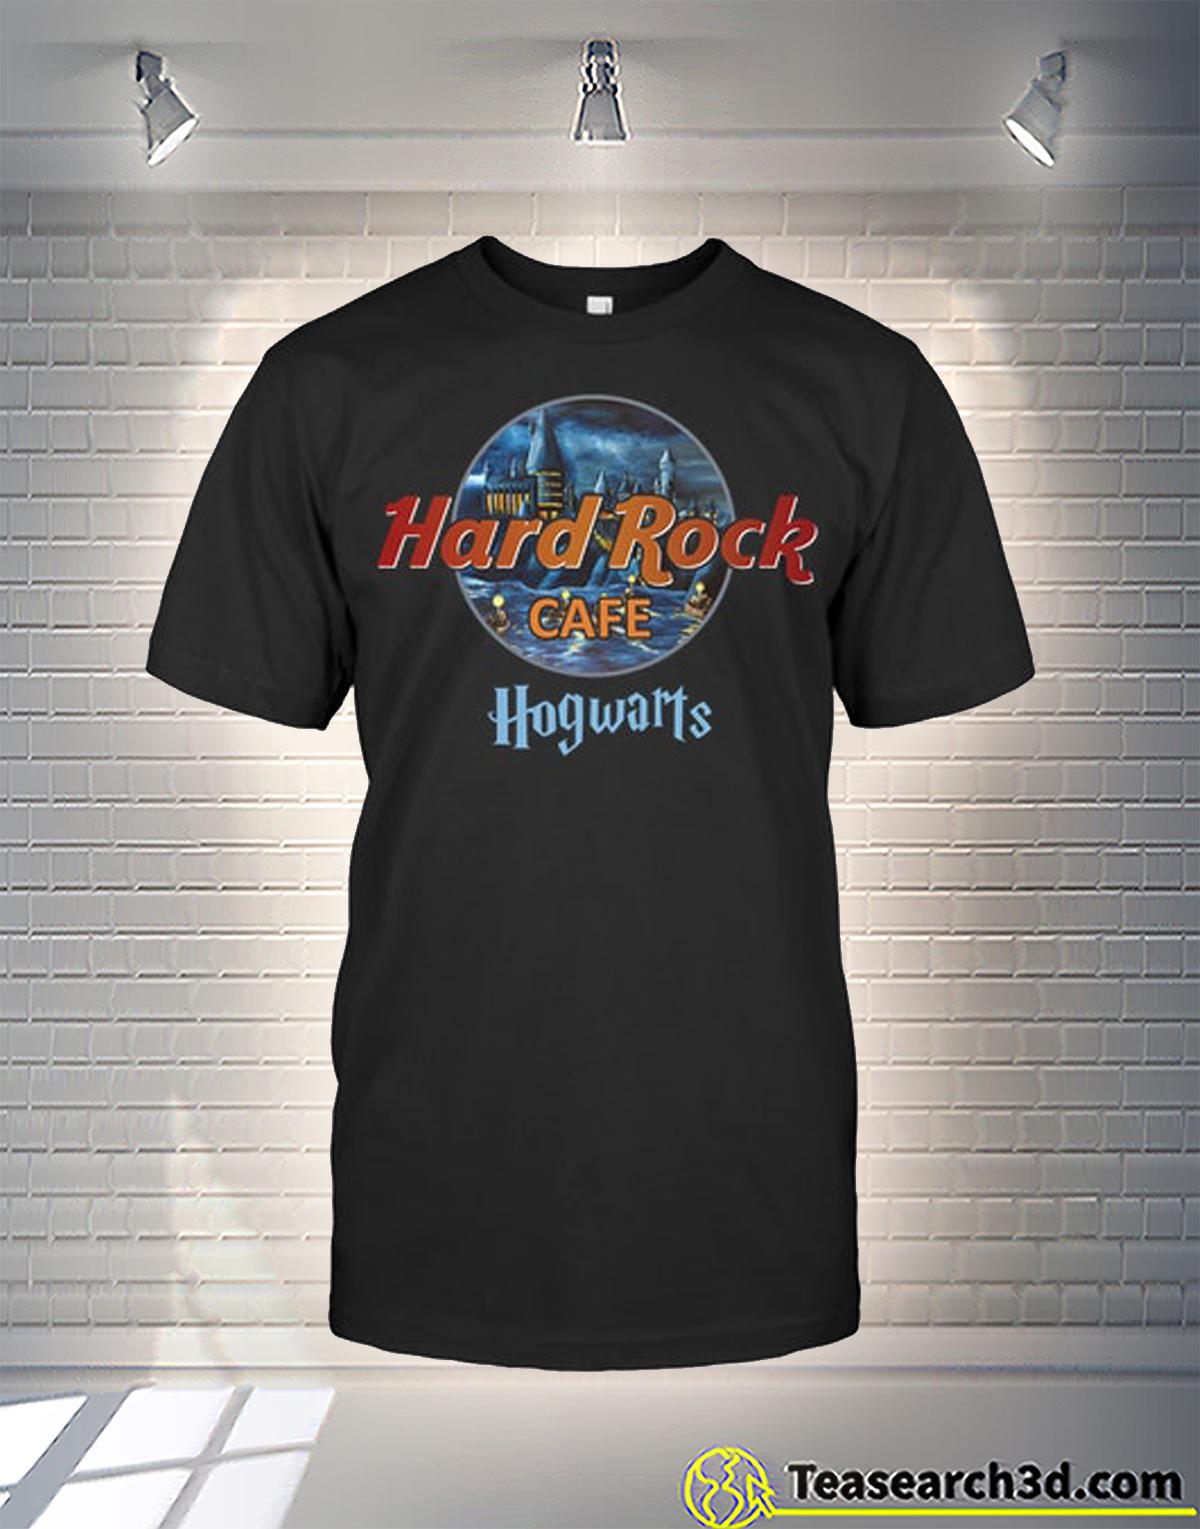 Hard rock cafe hogwarts shirt